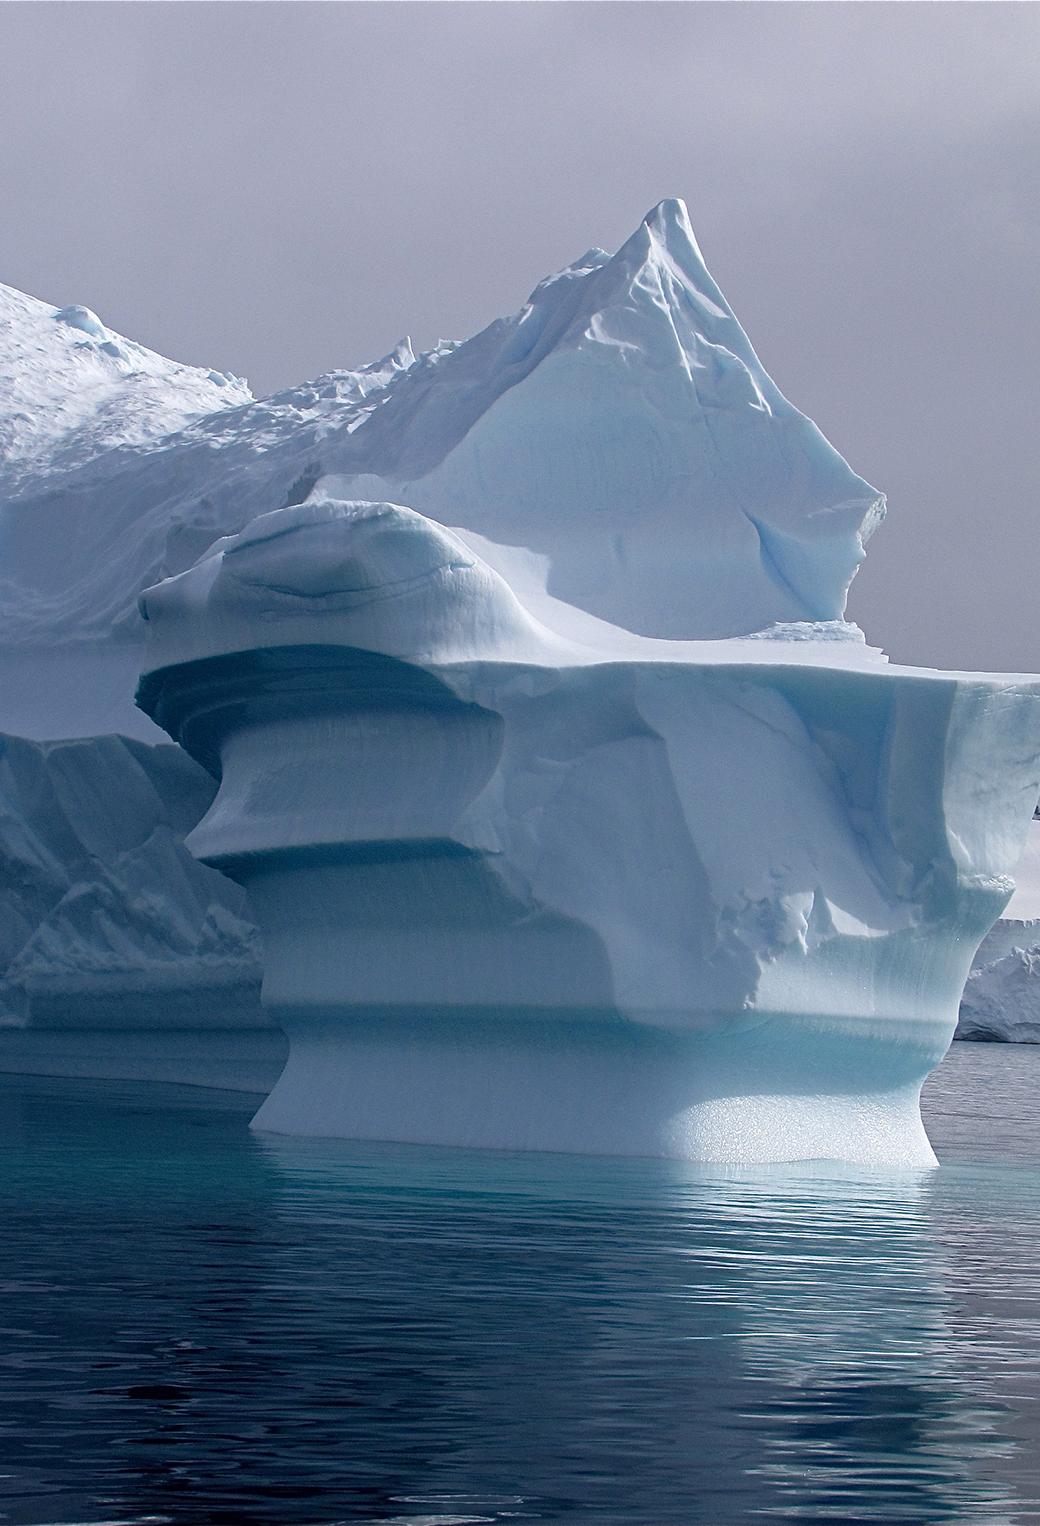 Antartic IceBerg 3Wallpapers iPhone parallax Antartic IceBerg